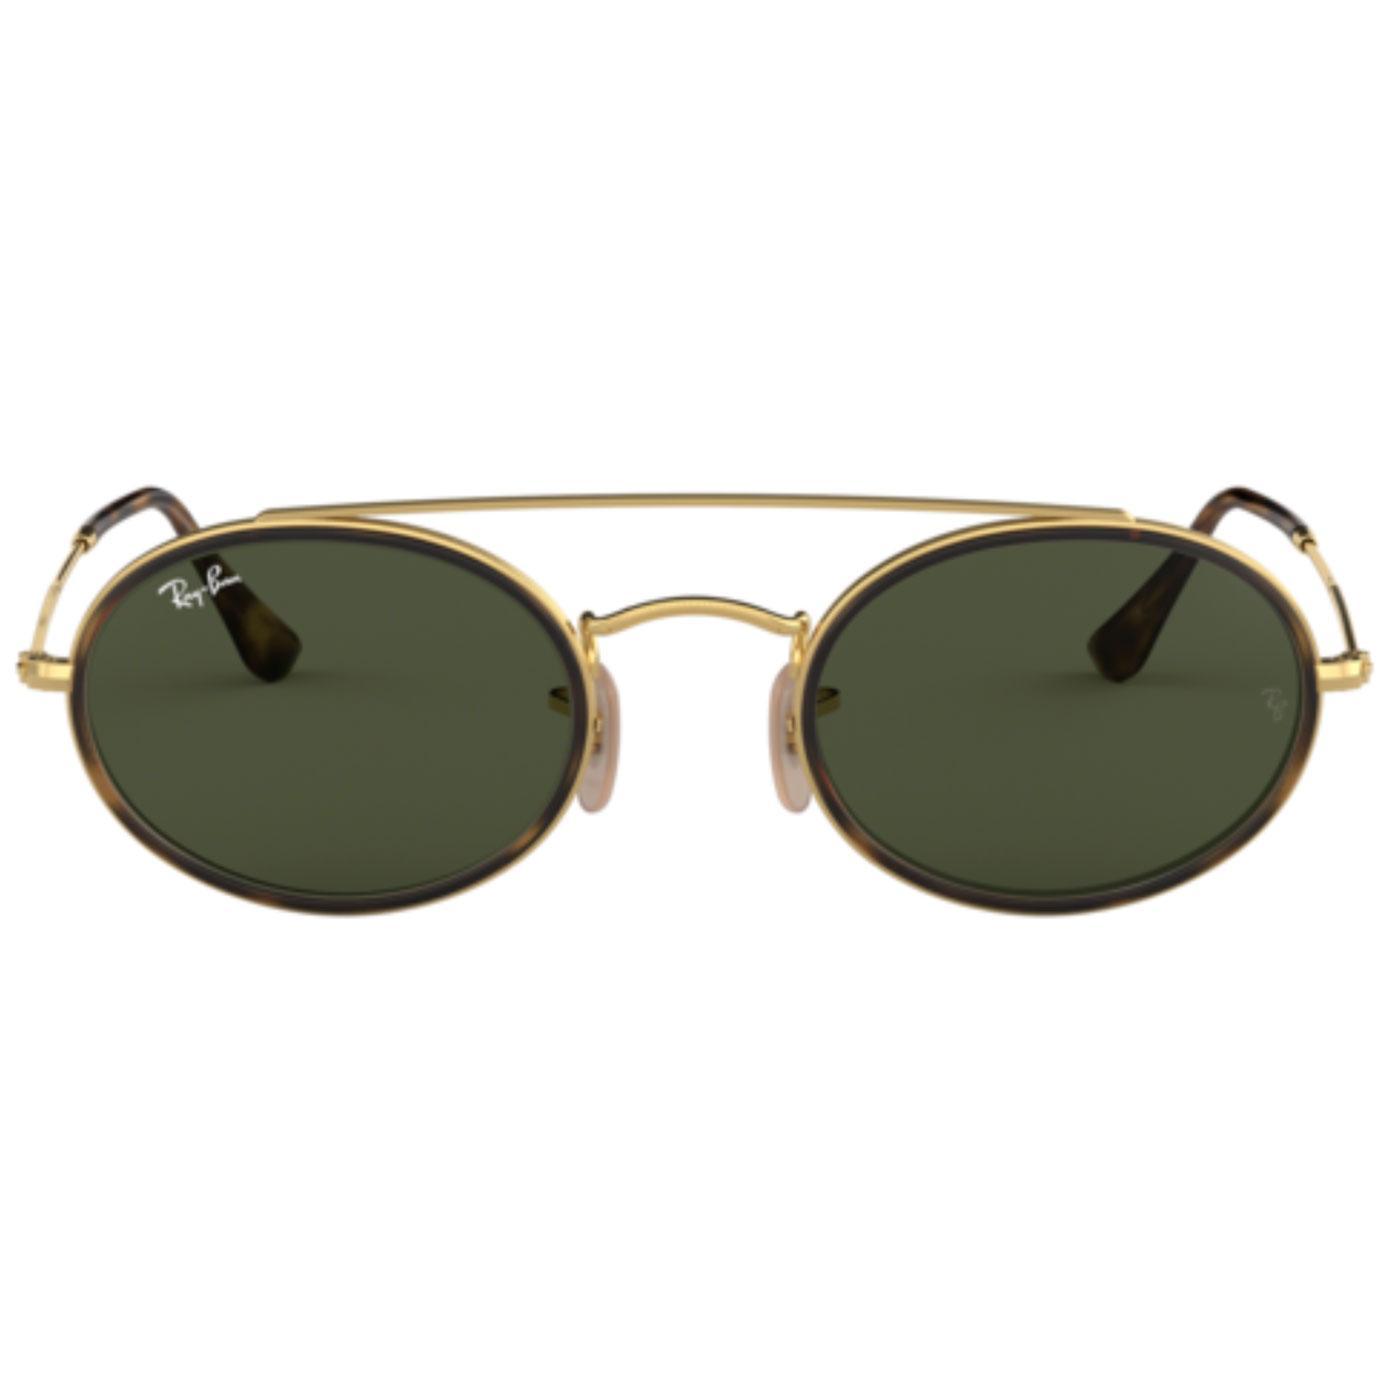 RAY-BAN Retro Double Bridge Round Sunglasses (G)